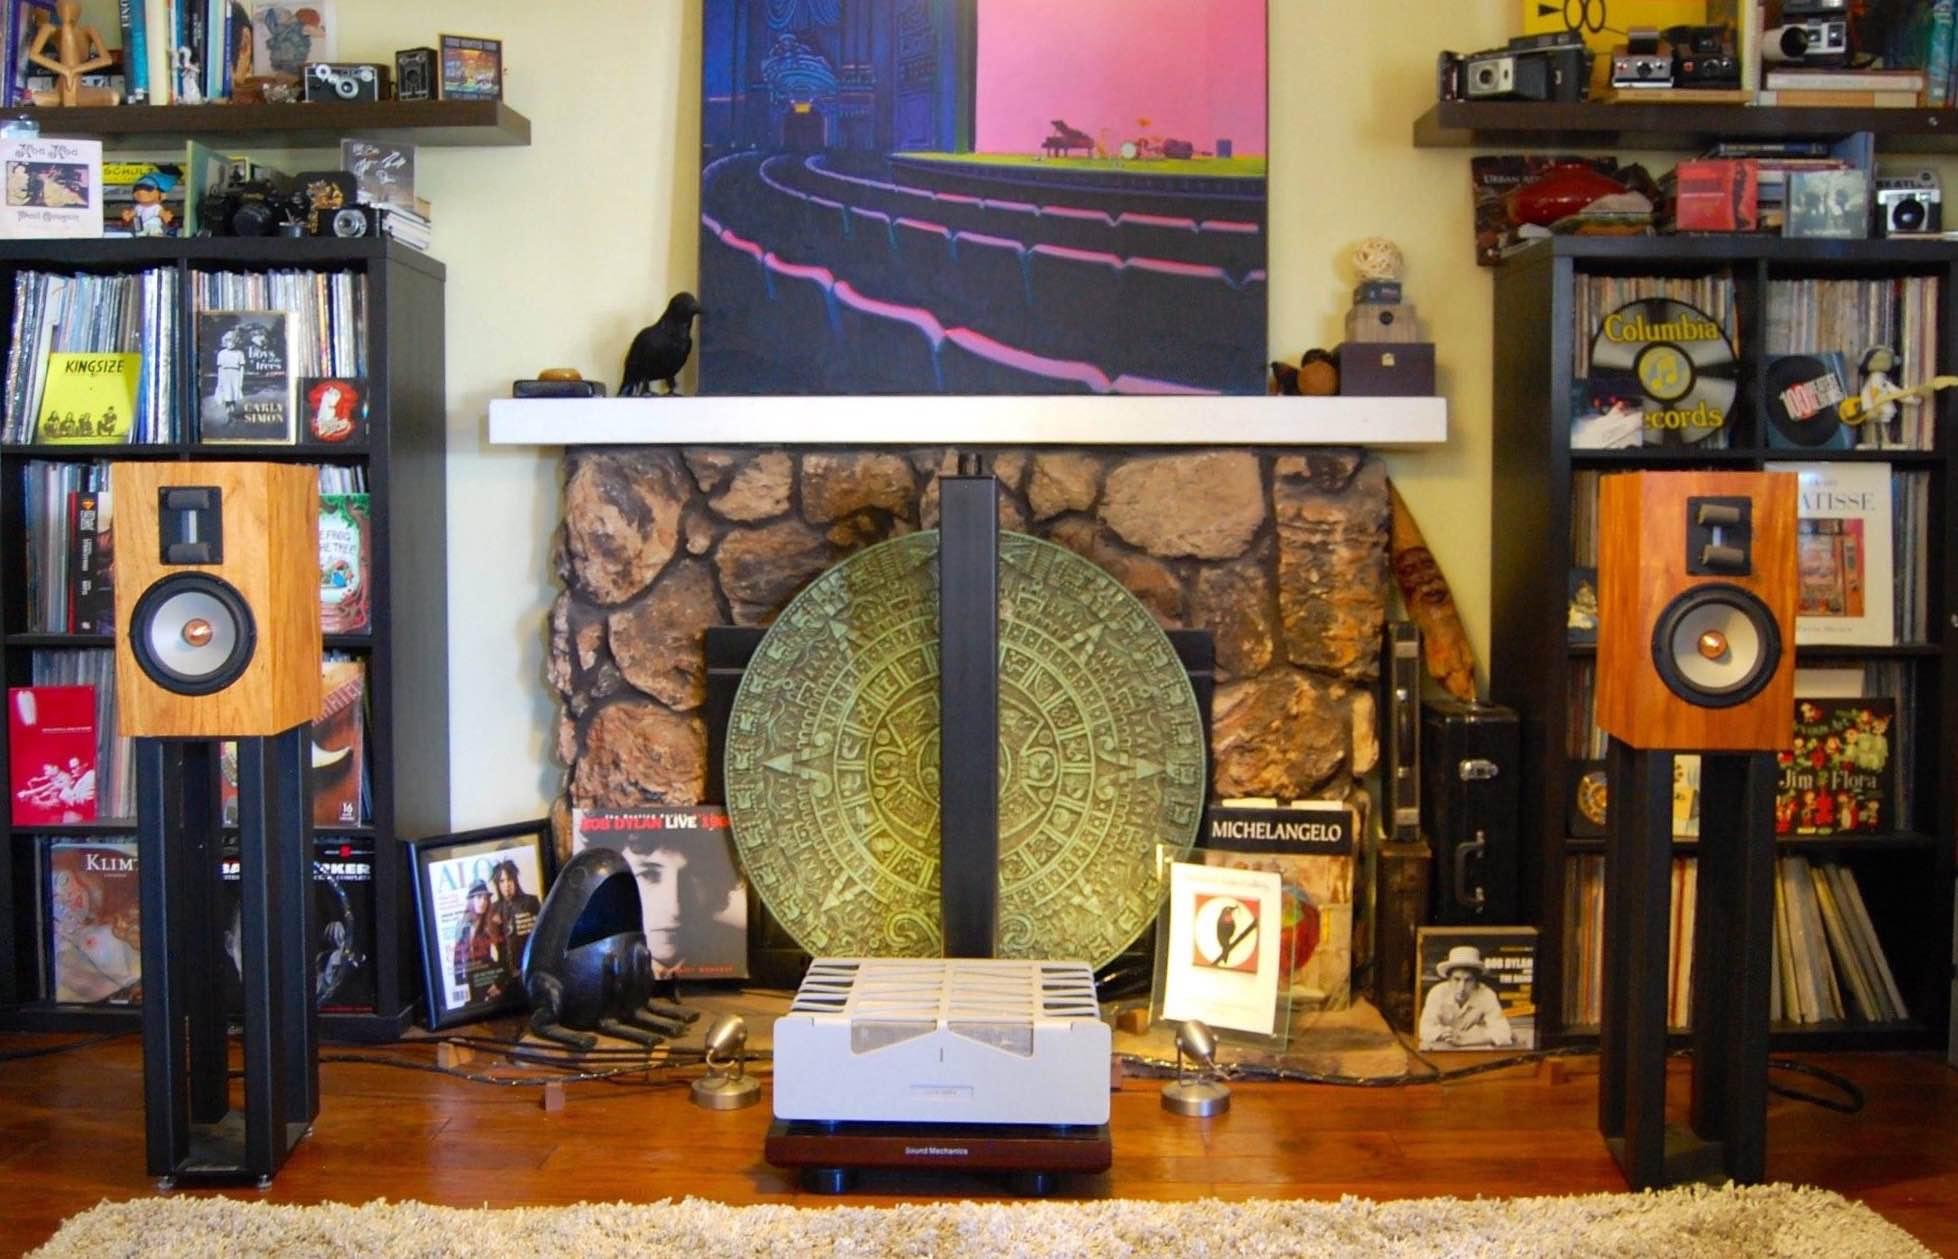 Image by Dan Muzquiz of 'Blackbird Audio Gallery', Santee, California USA.